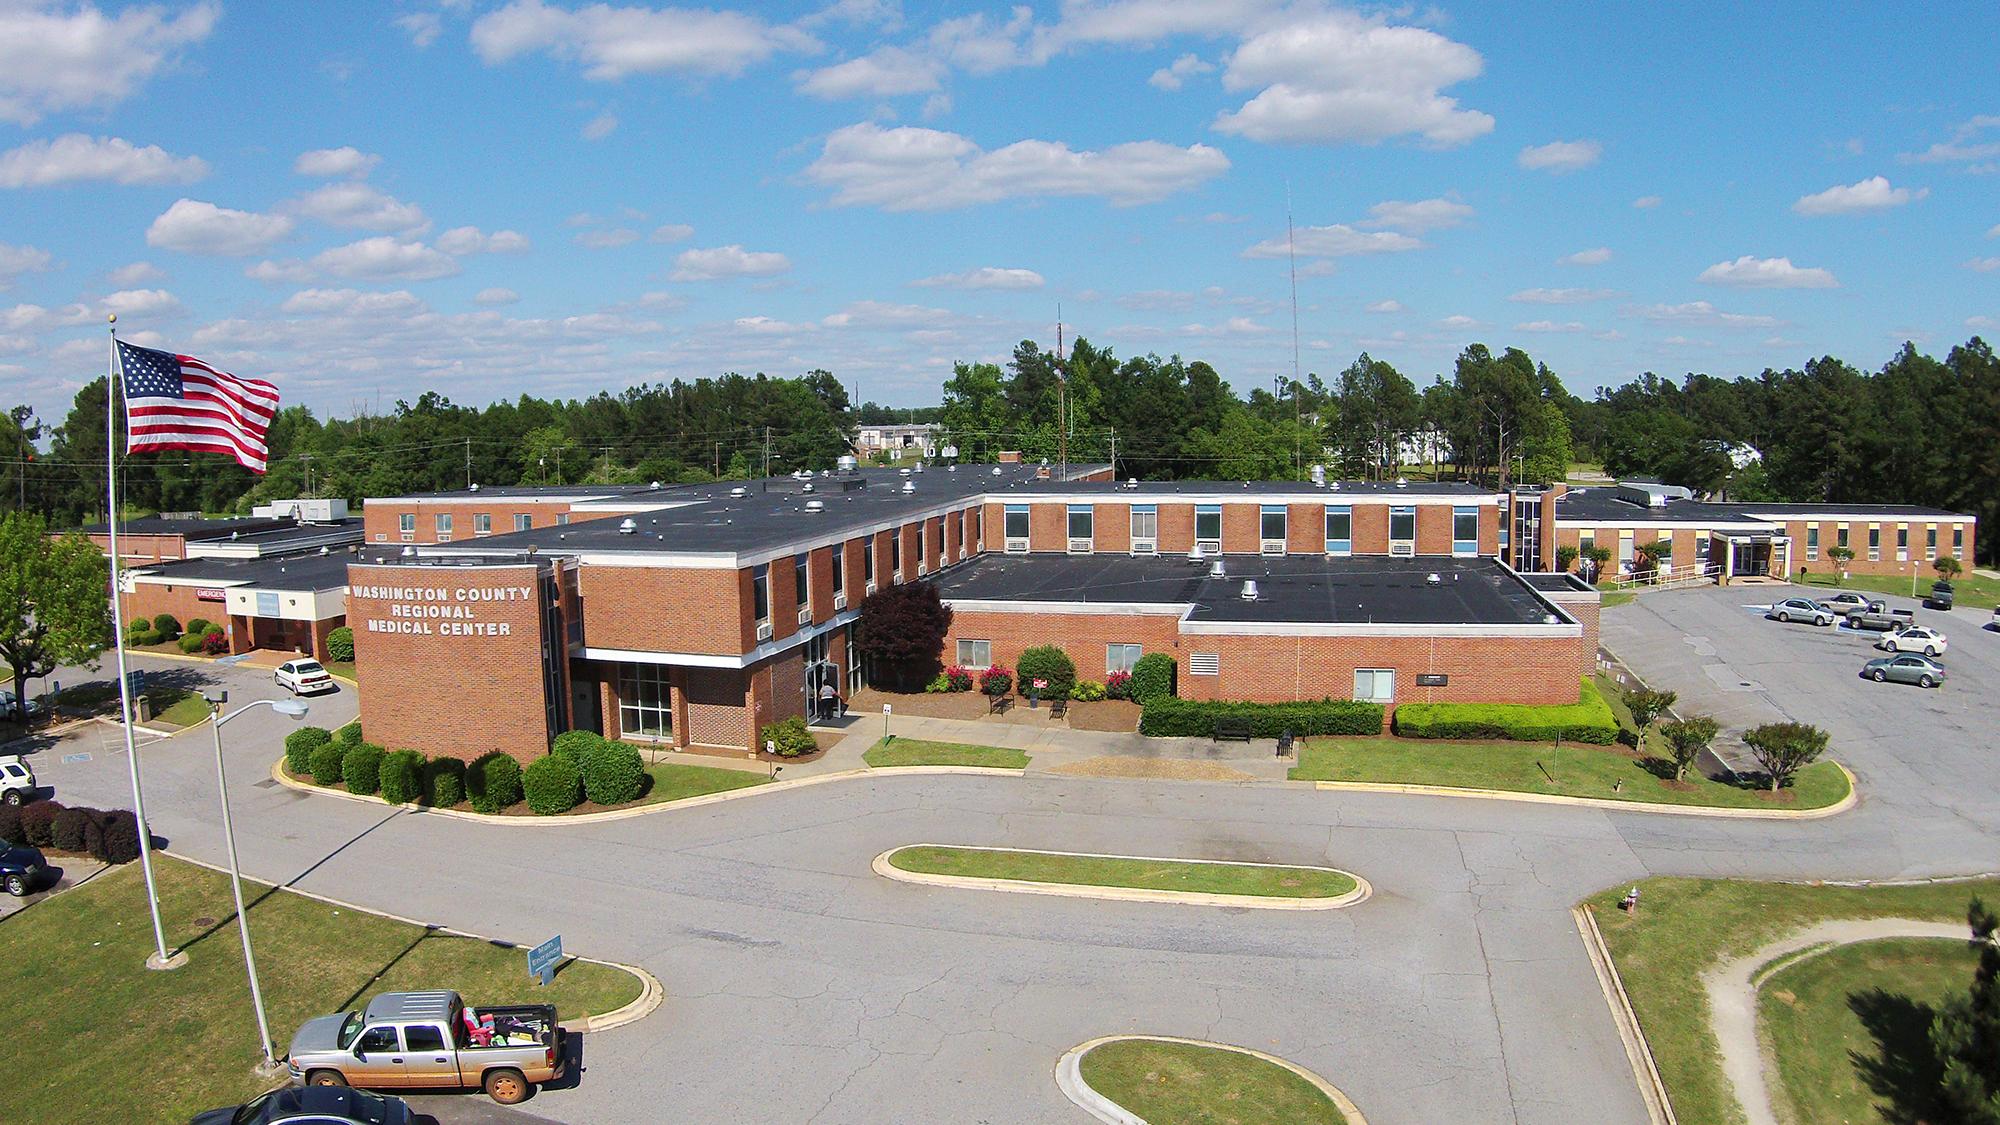 Washington-County-Regional-Medical-Center